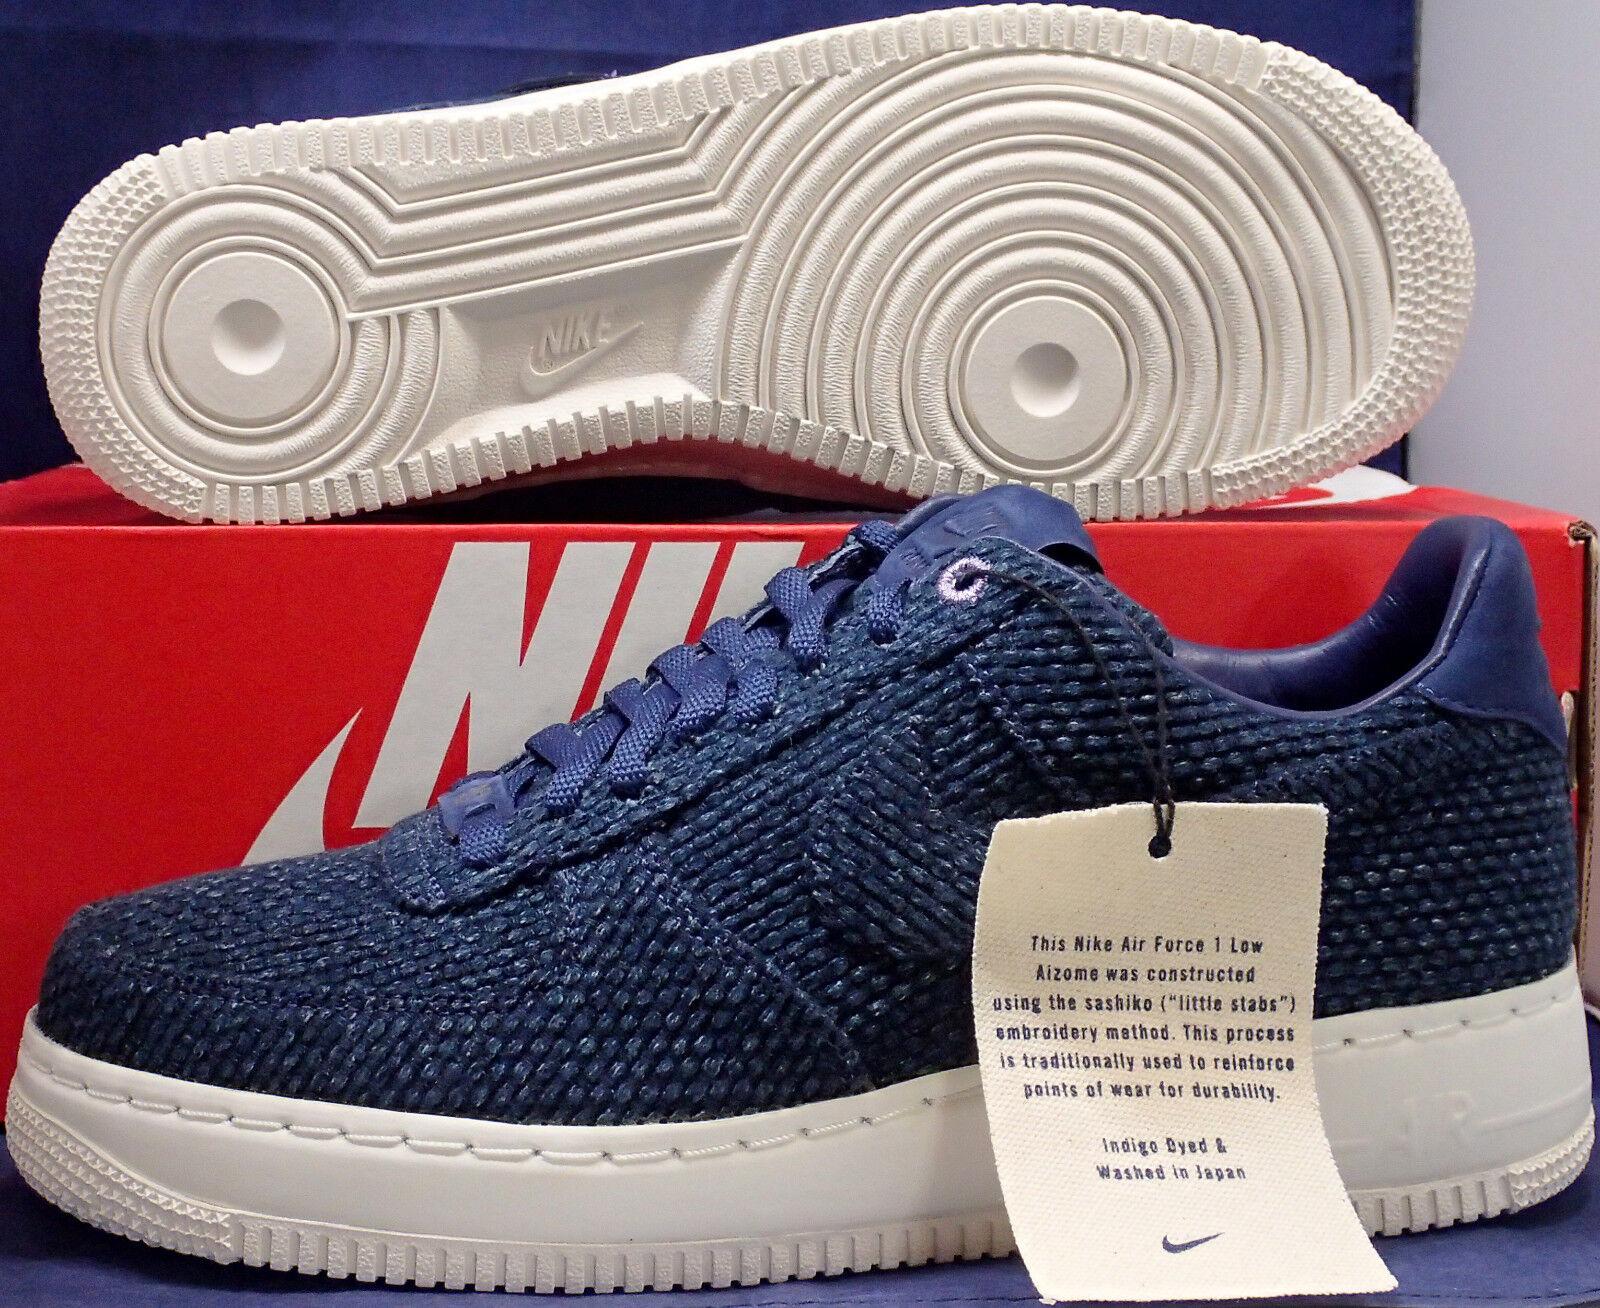 Nike basso air force 1 basso Nike ecco sashiko giappone mezzanotte marina sz noi 7,5 (ar4670-444) 7761c7